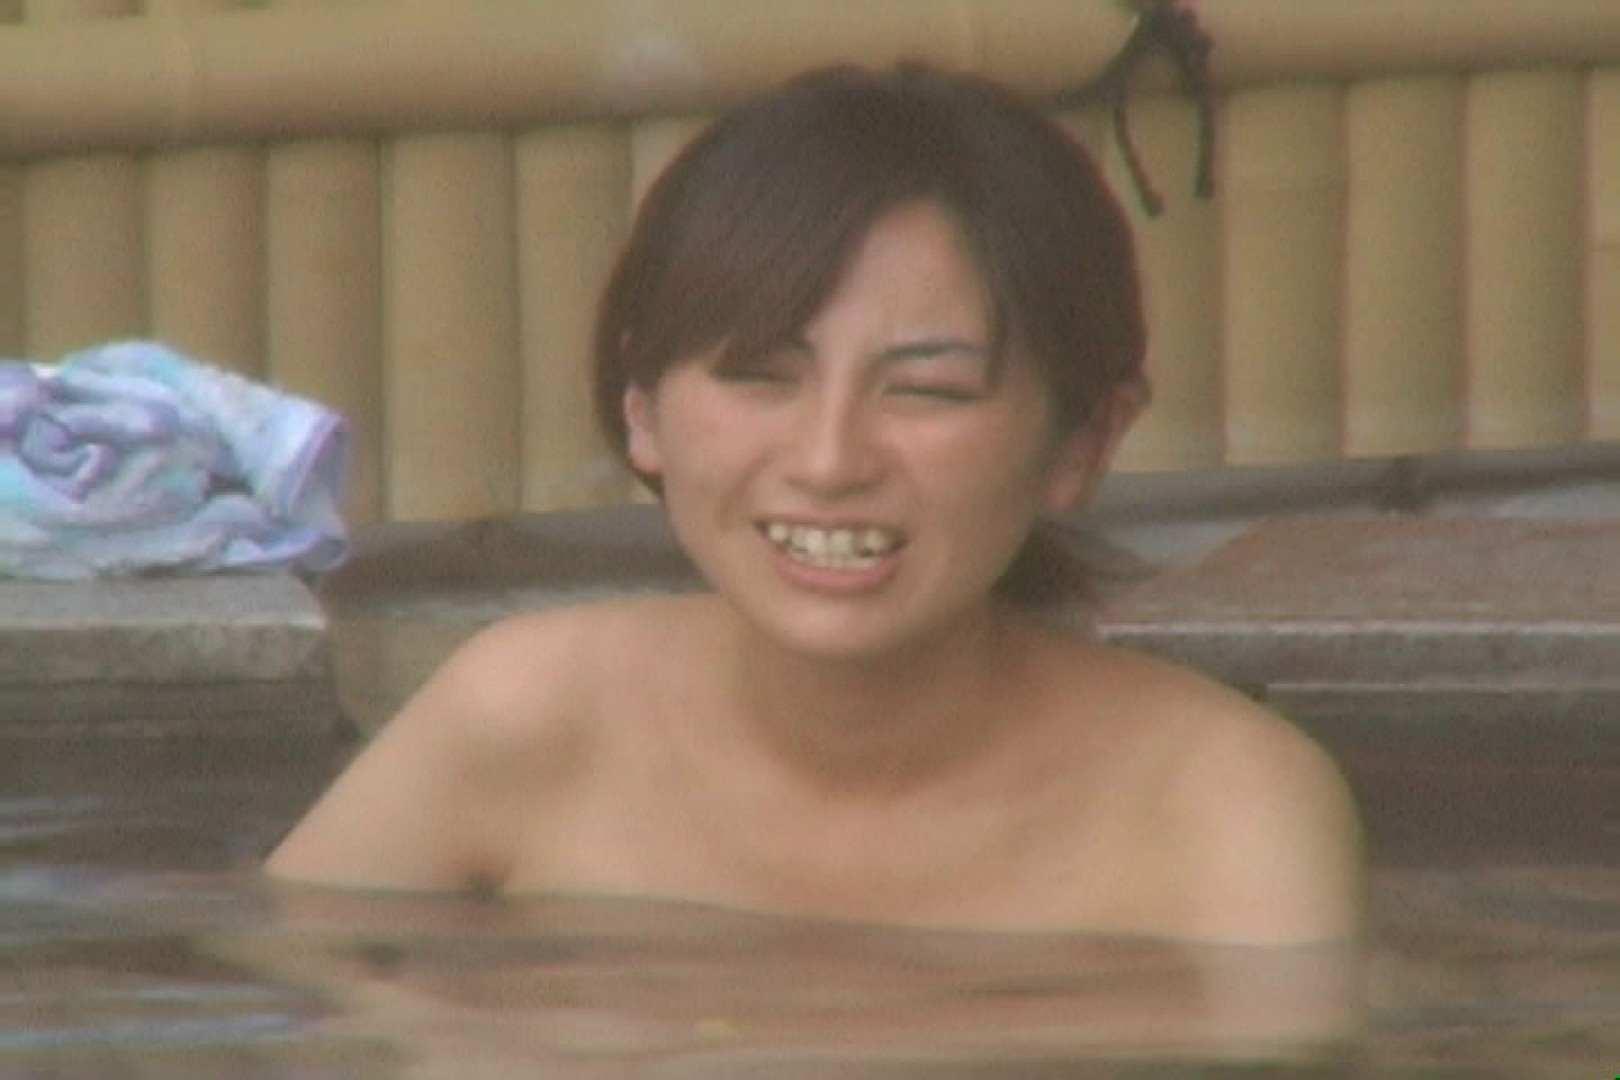 Aquaな露天風呂Vol.26【VIP】 OLセックス 盗み撮りオマンコ動画キャプチャ 59画像 38